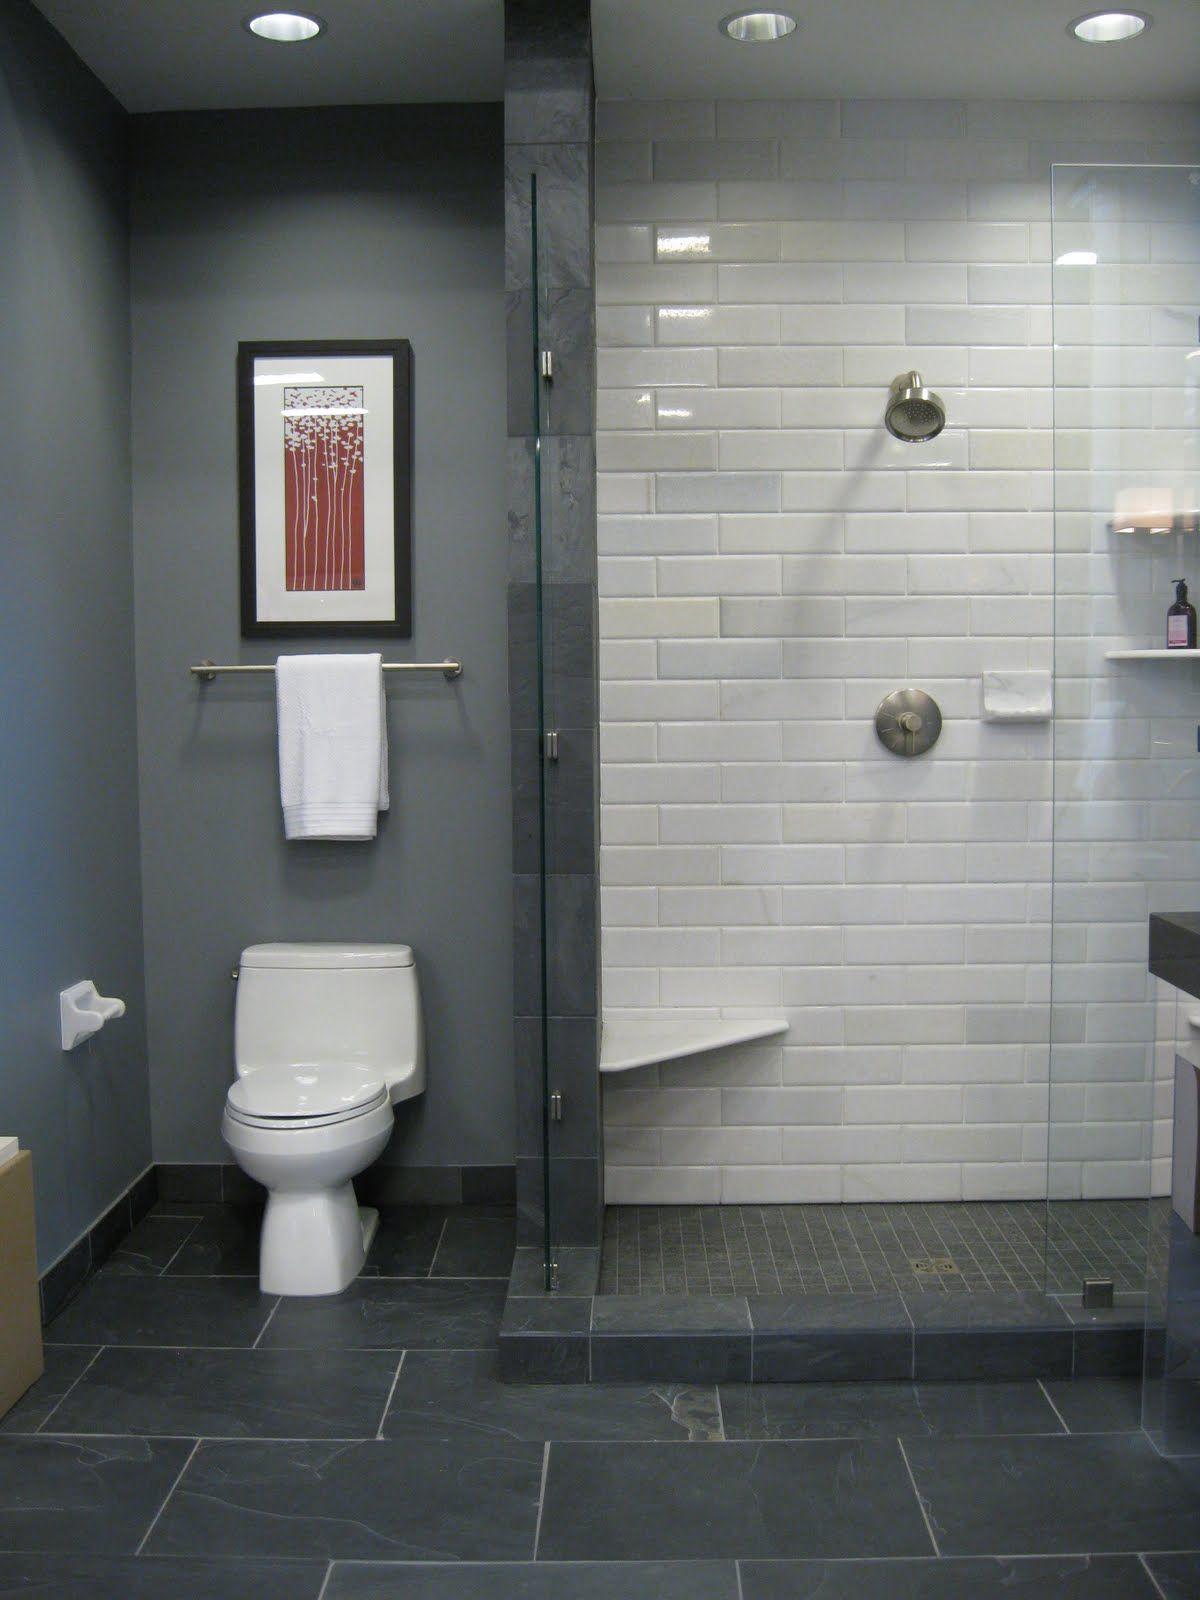 Black slate bathroom floor - Black Slate Bathroom White Shower Bathroom With A Shower Tile From The Tileshop Black Blue Walls Paint Color Gray Slate Tiles Floor